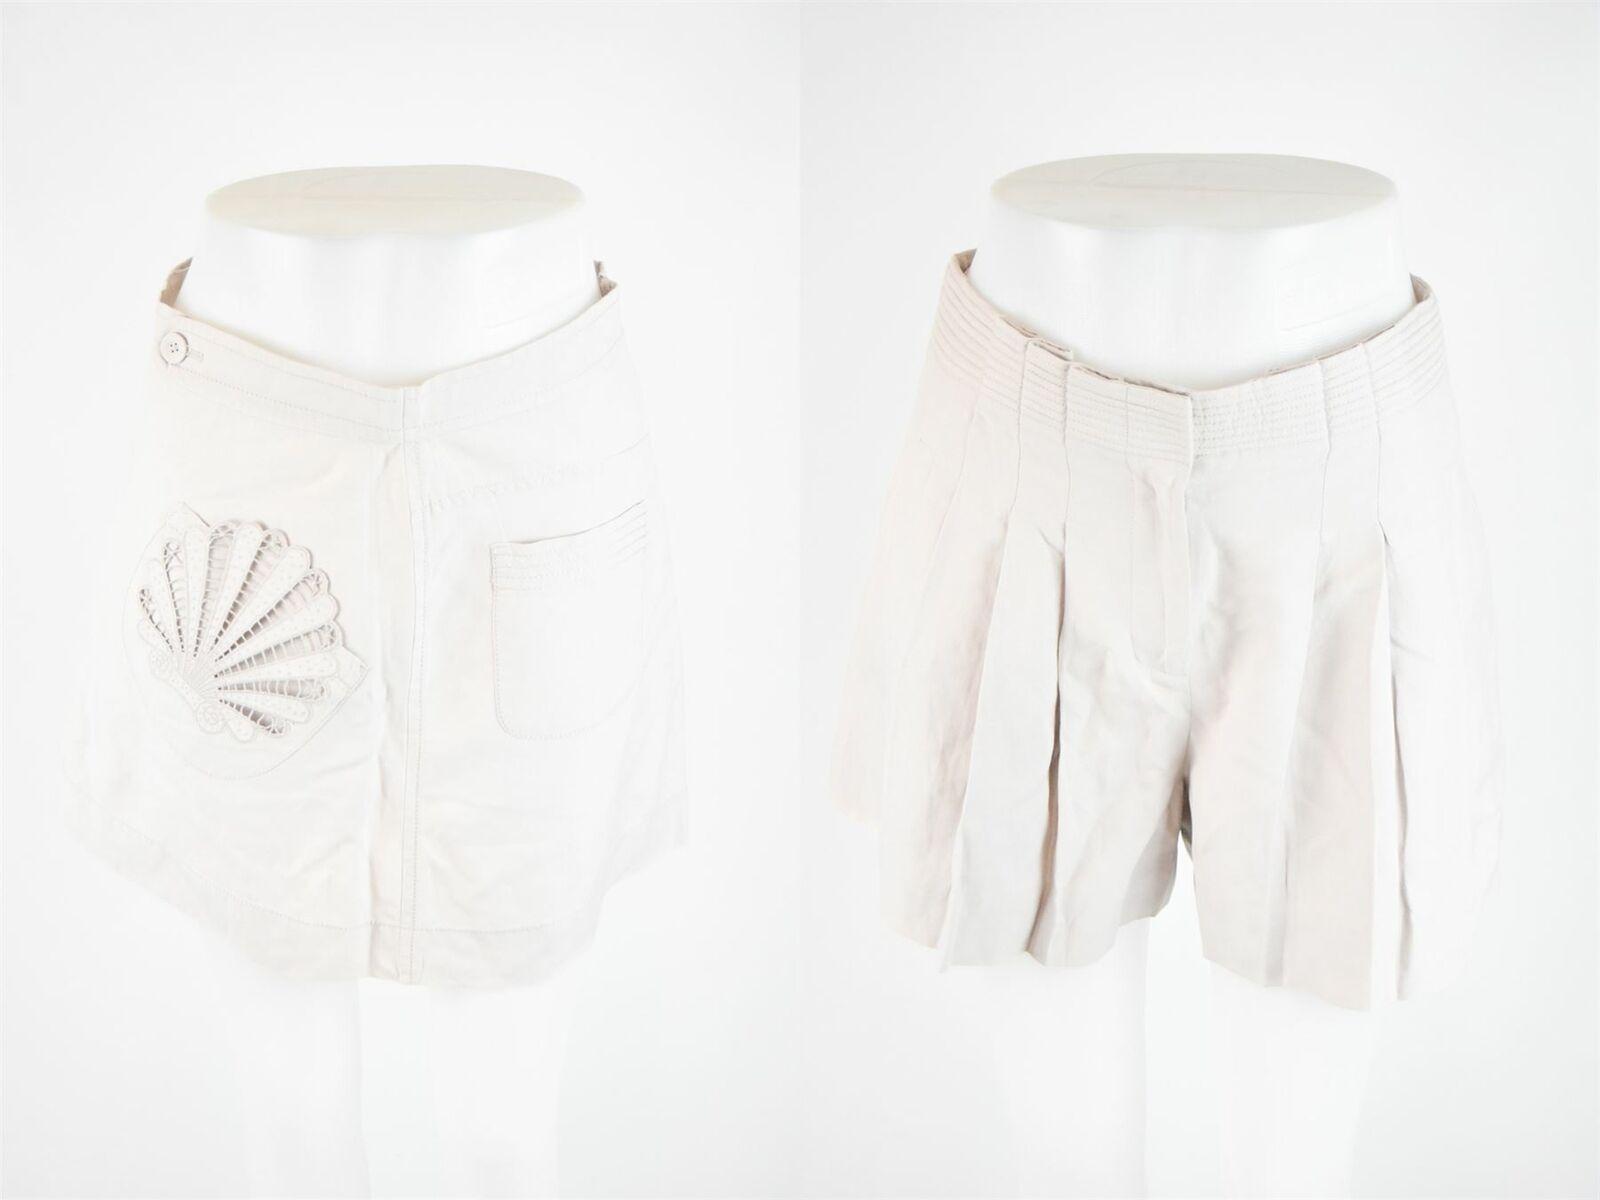 JAEGER LONDON Beige Silk Blend Skirts & Shorts, US 4